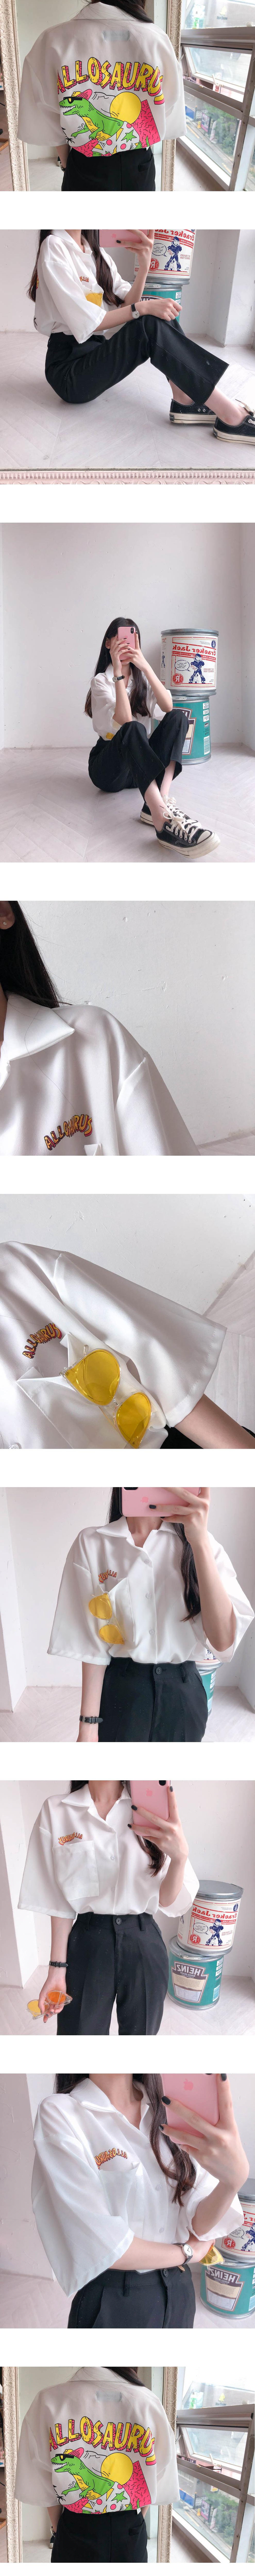 Allosaurs short-sleeved shirt